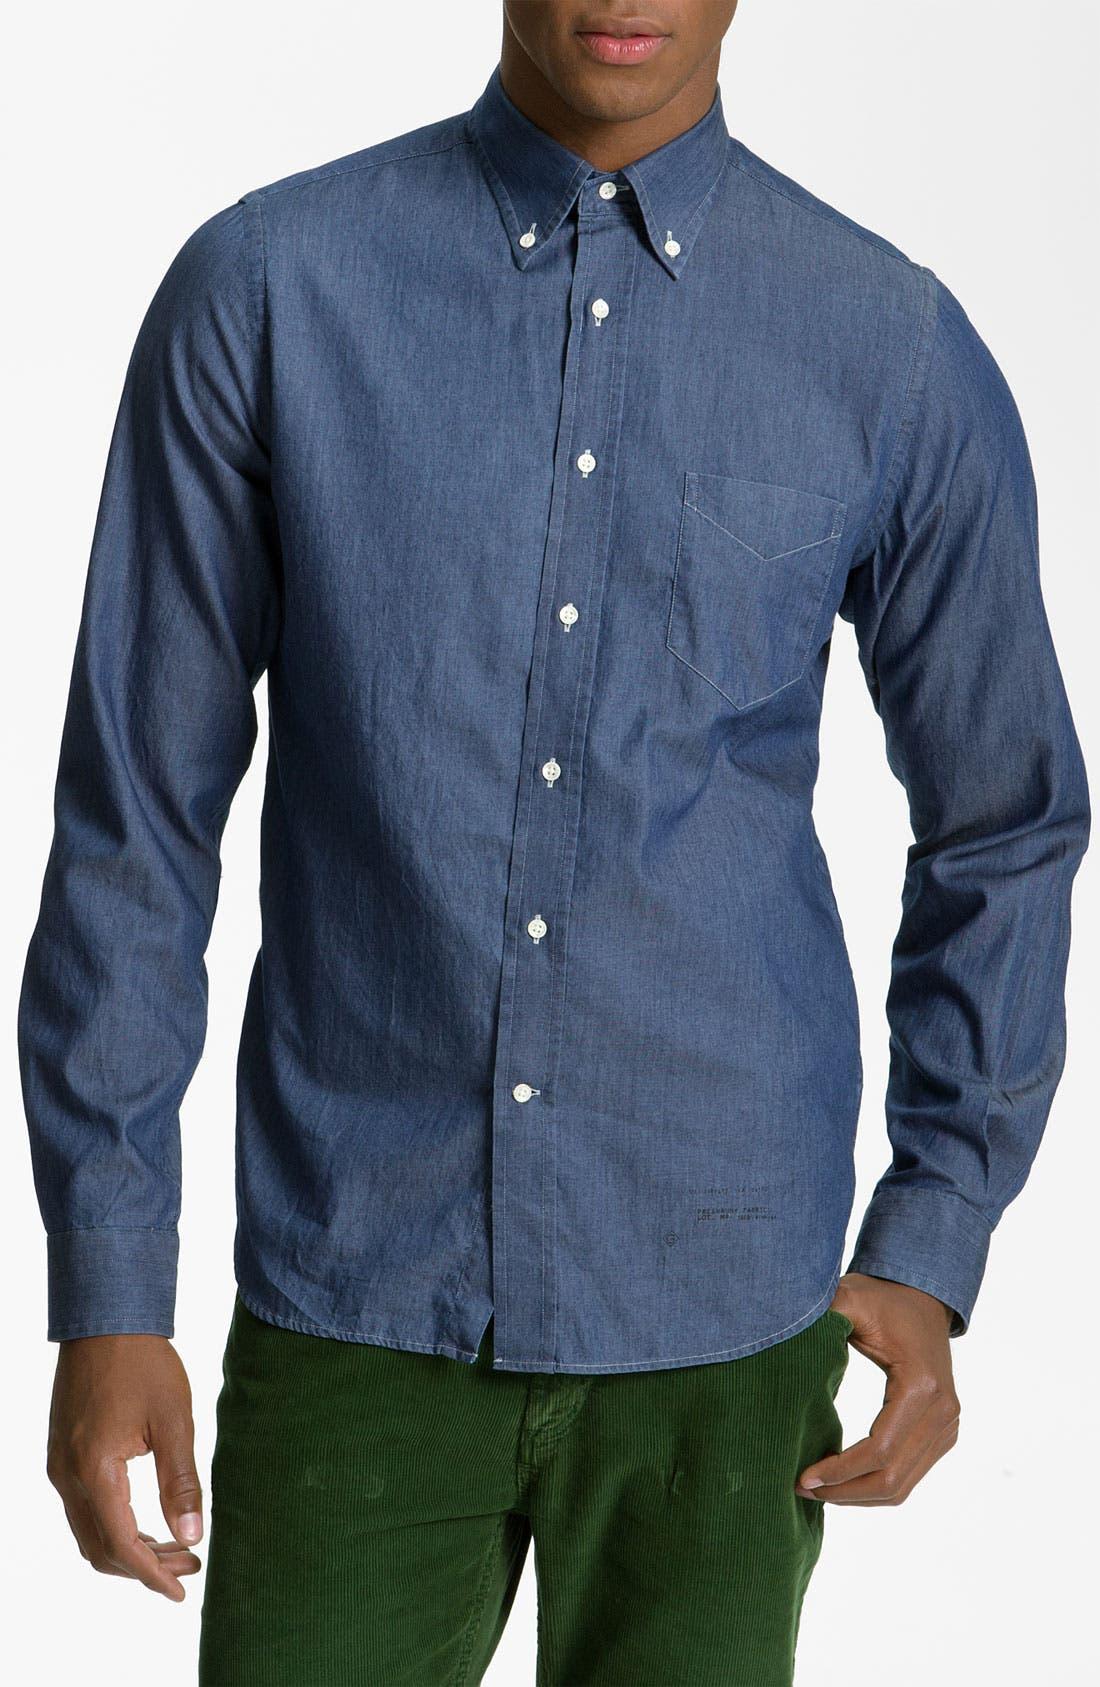 Main Image - Gant Rugger 'Luxury' Woven Shirt